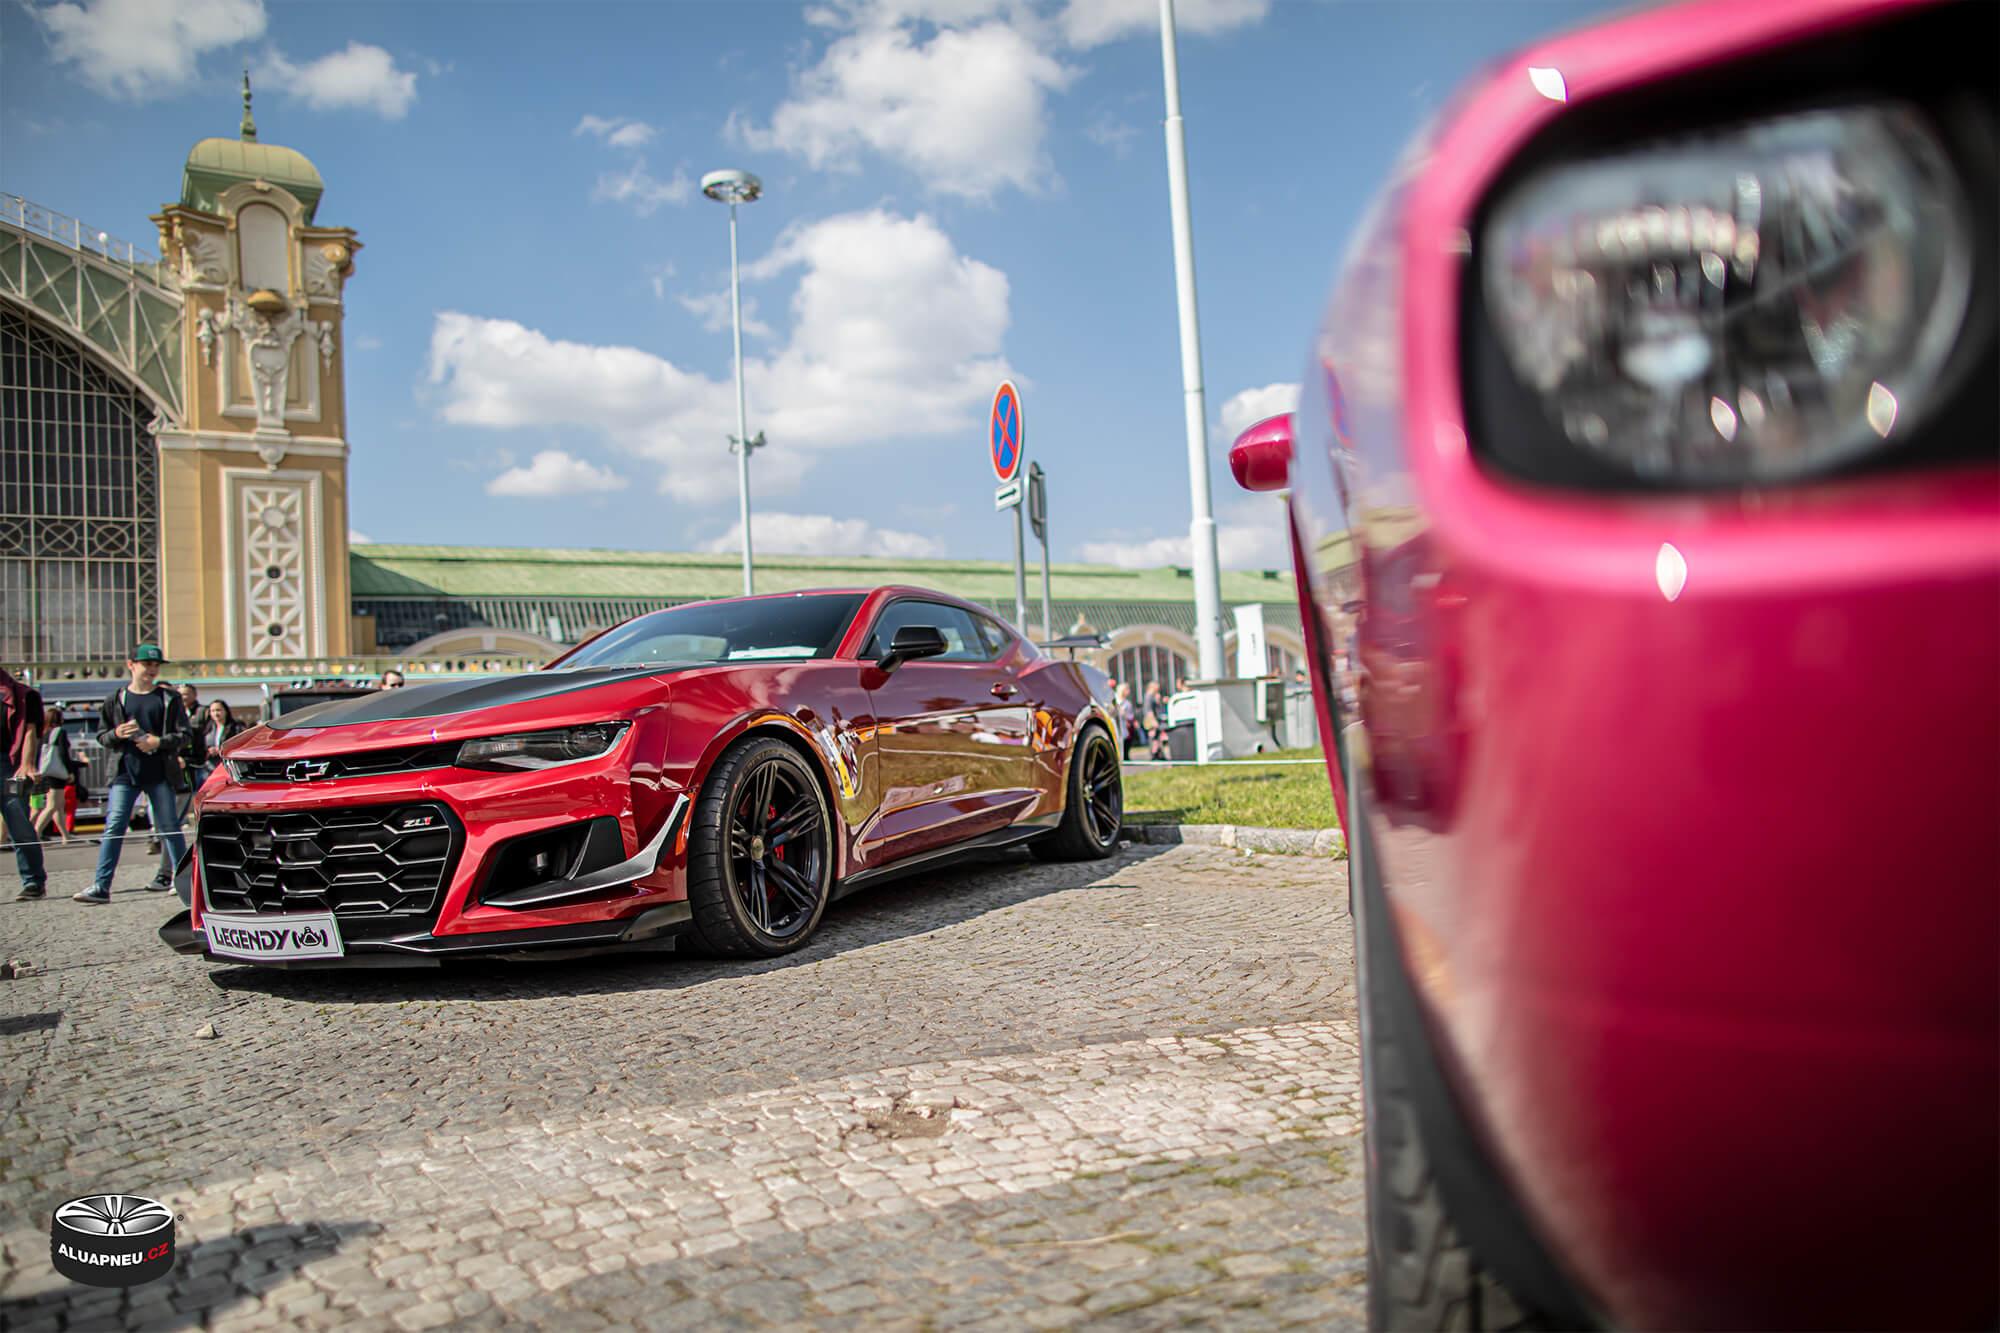 Černá alu kola Chevrolet Camaro - originální elektrony Chevrolet  - Automobilové Legendy 2019 - www.aluapneu.cz